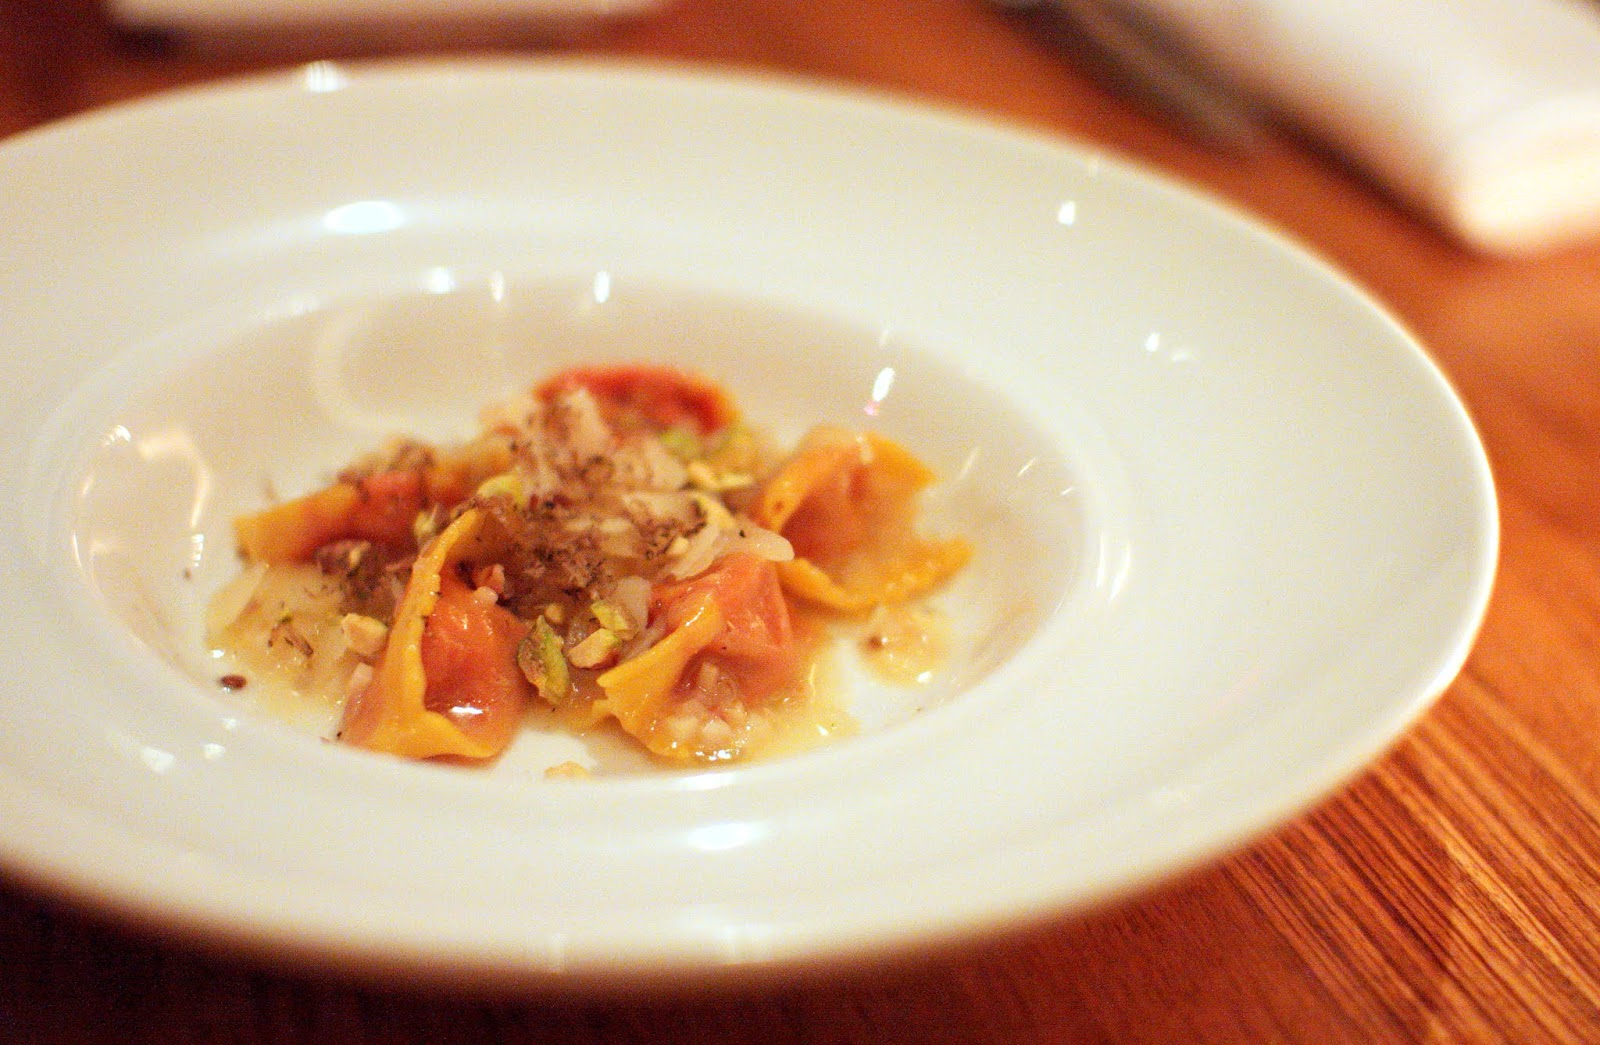 Pistachio, Celeriac, Butter Braised Vidalia Onions, Grana Padano